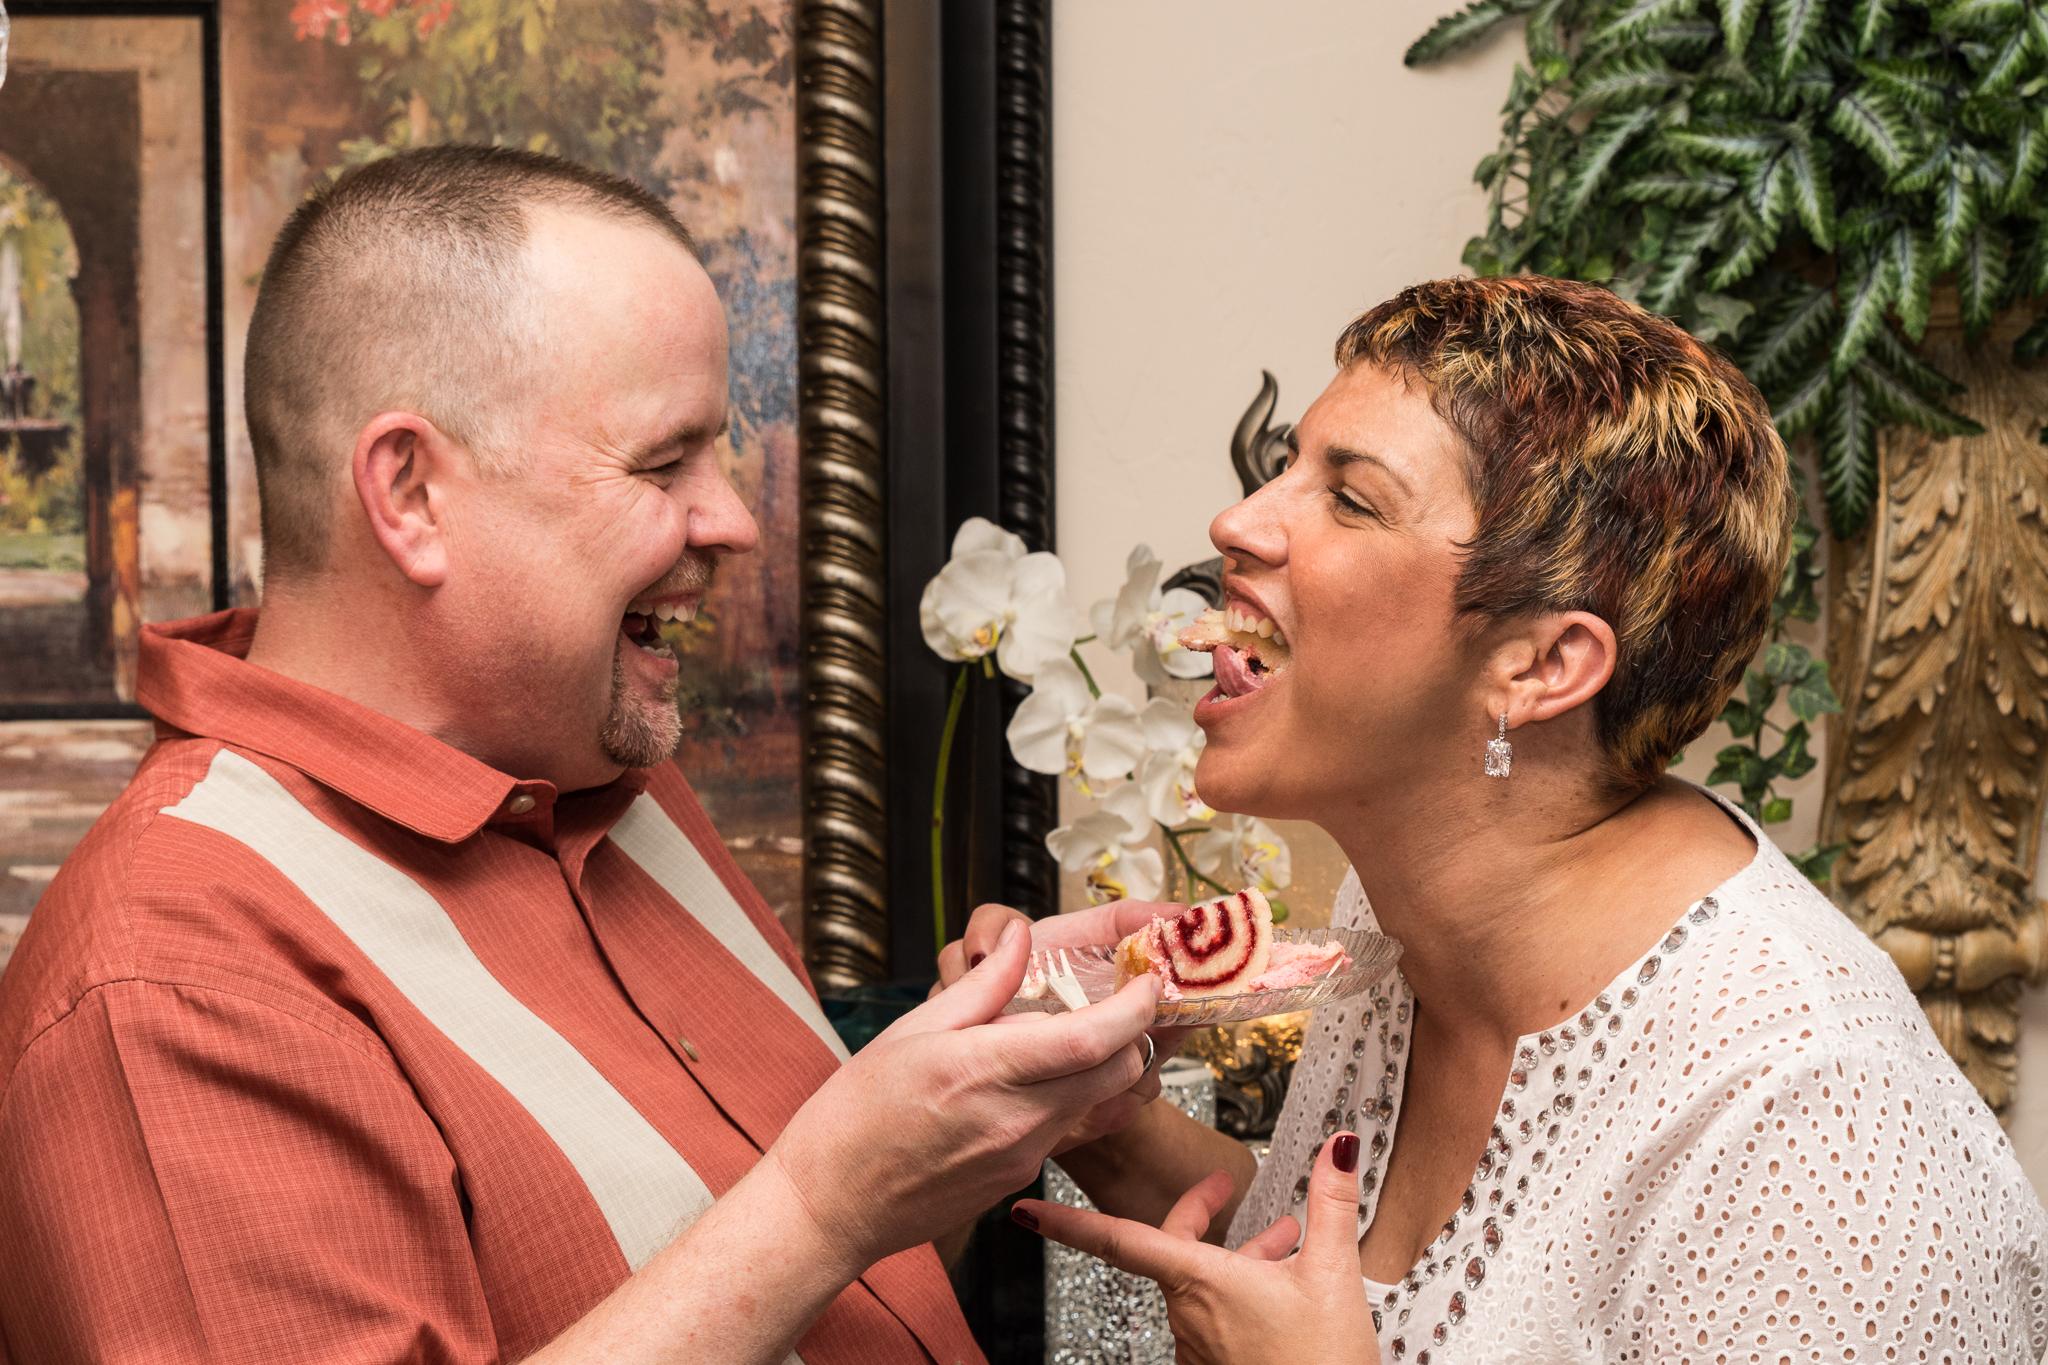 Enjoying the cake. Wedding Photography by Betchel Photography of Edmond.